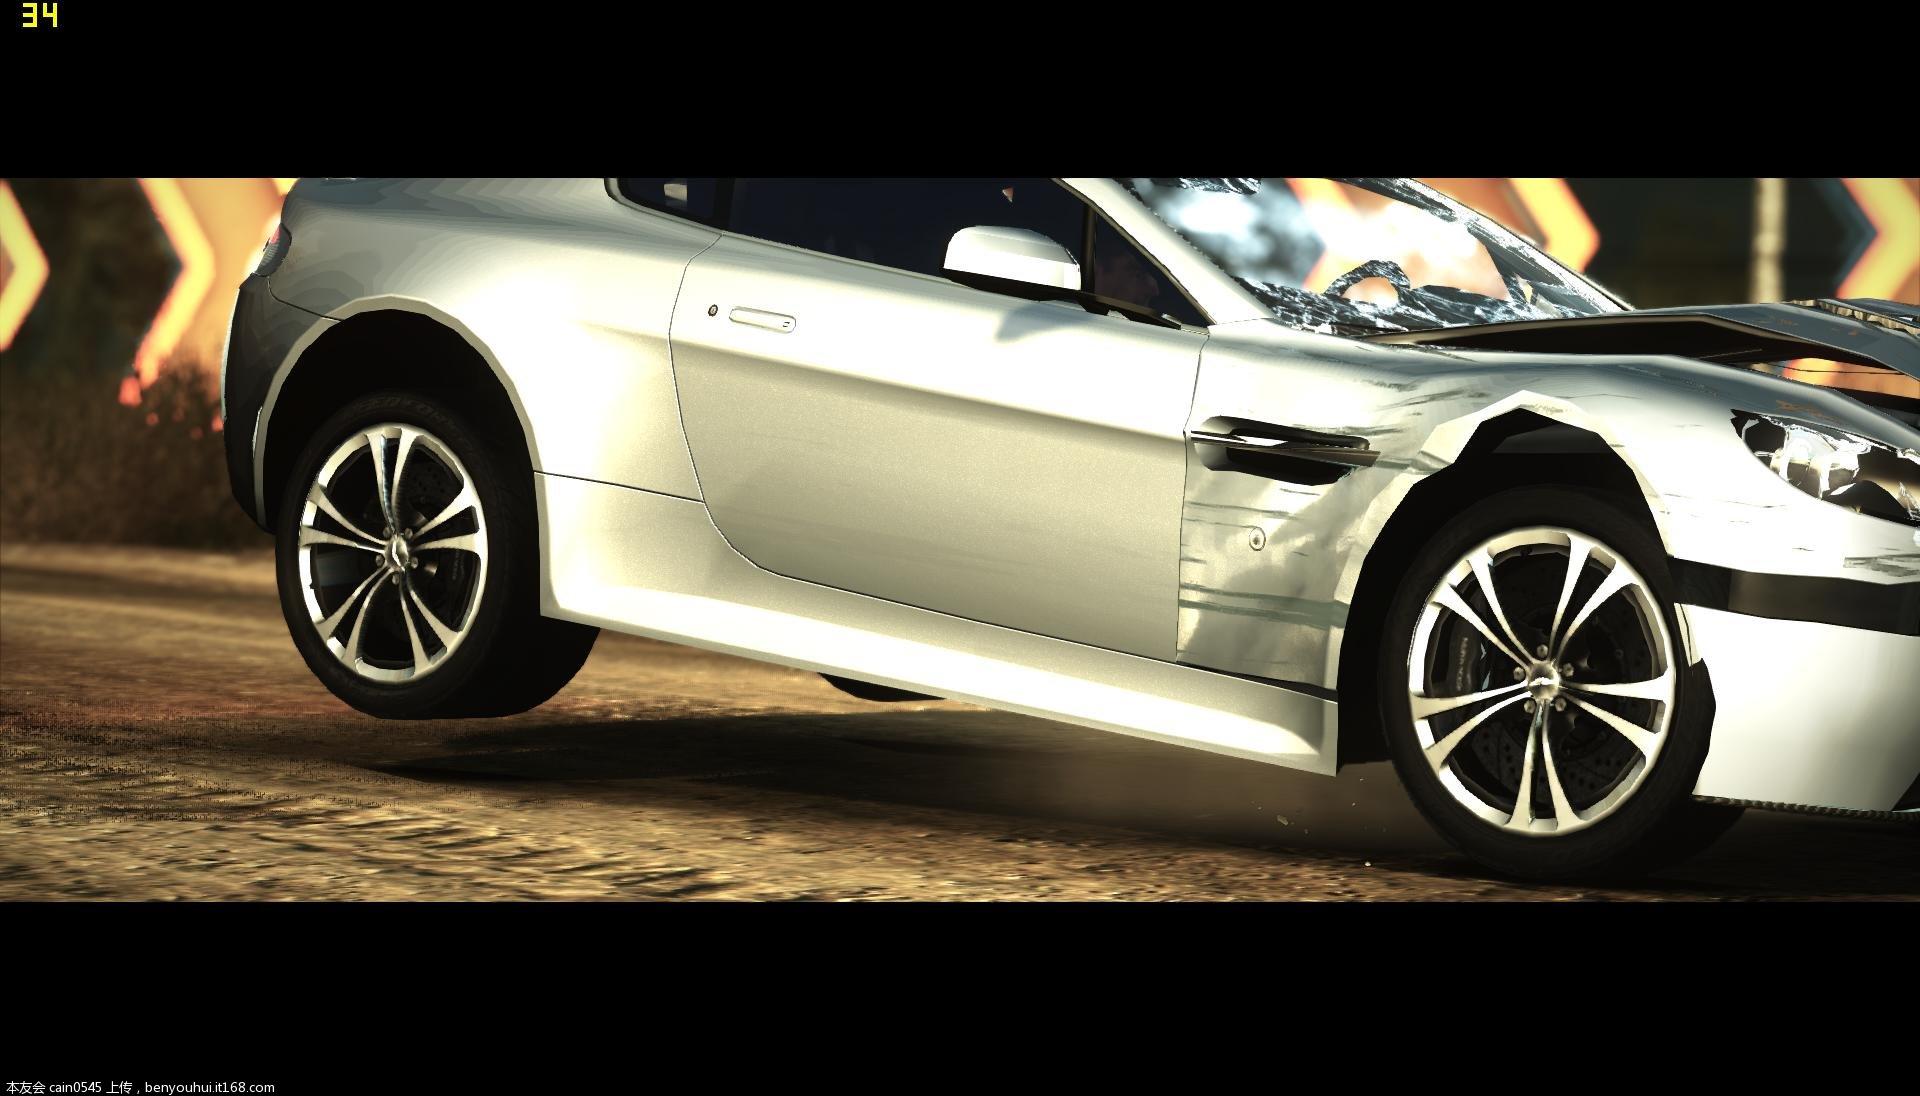 Need For Speed The Run 2012-10-10 01-23-35-50.jpg